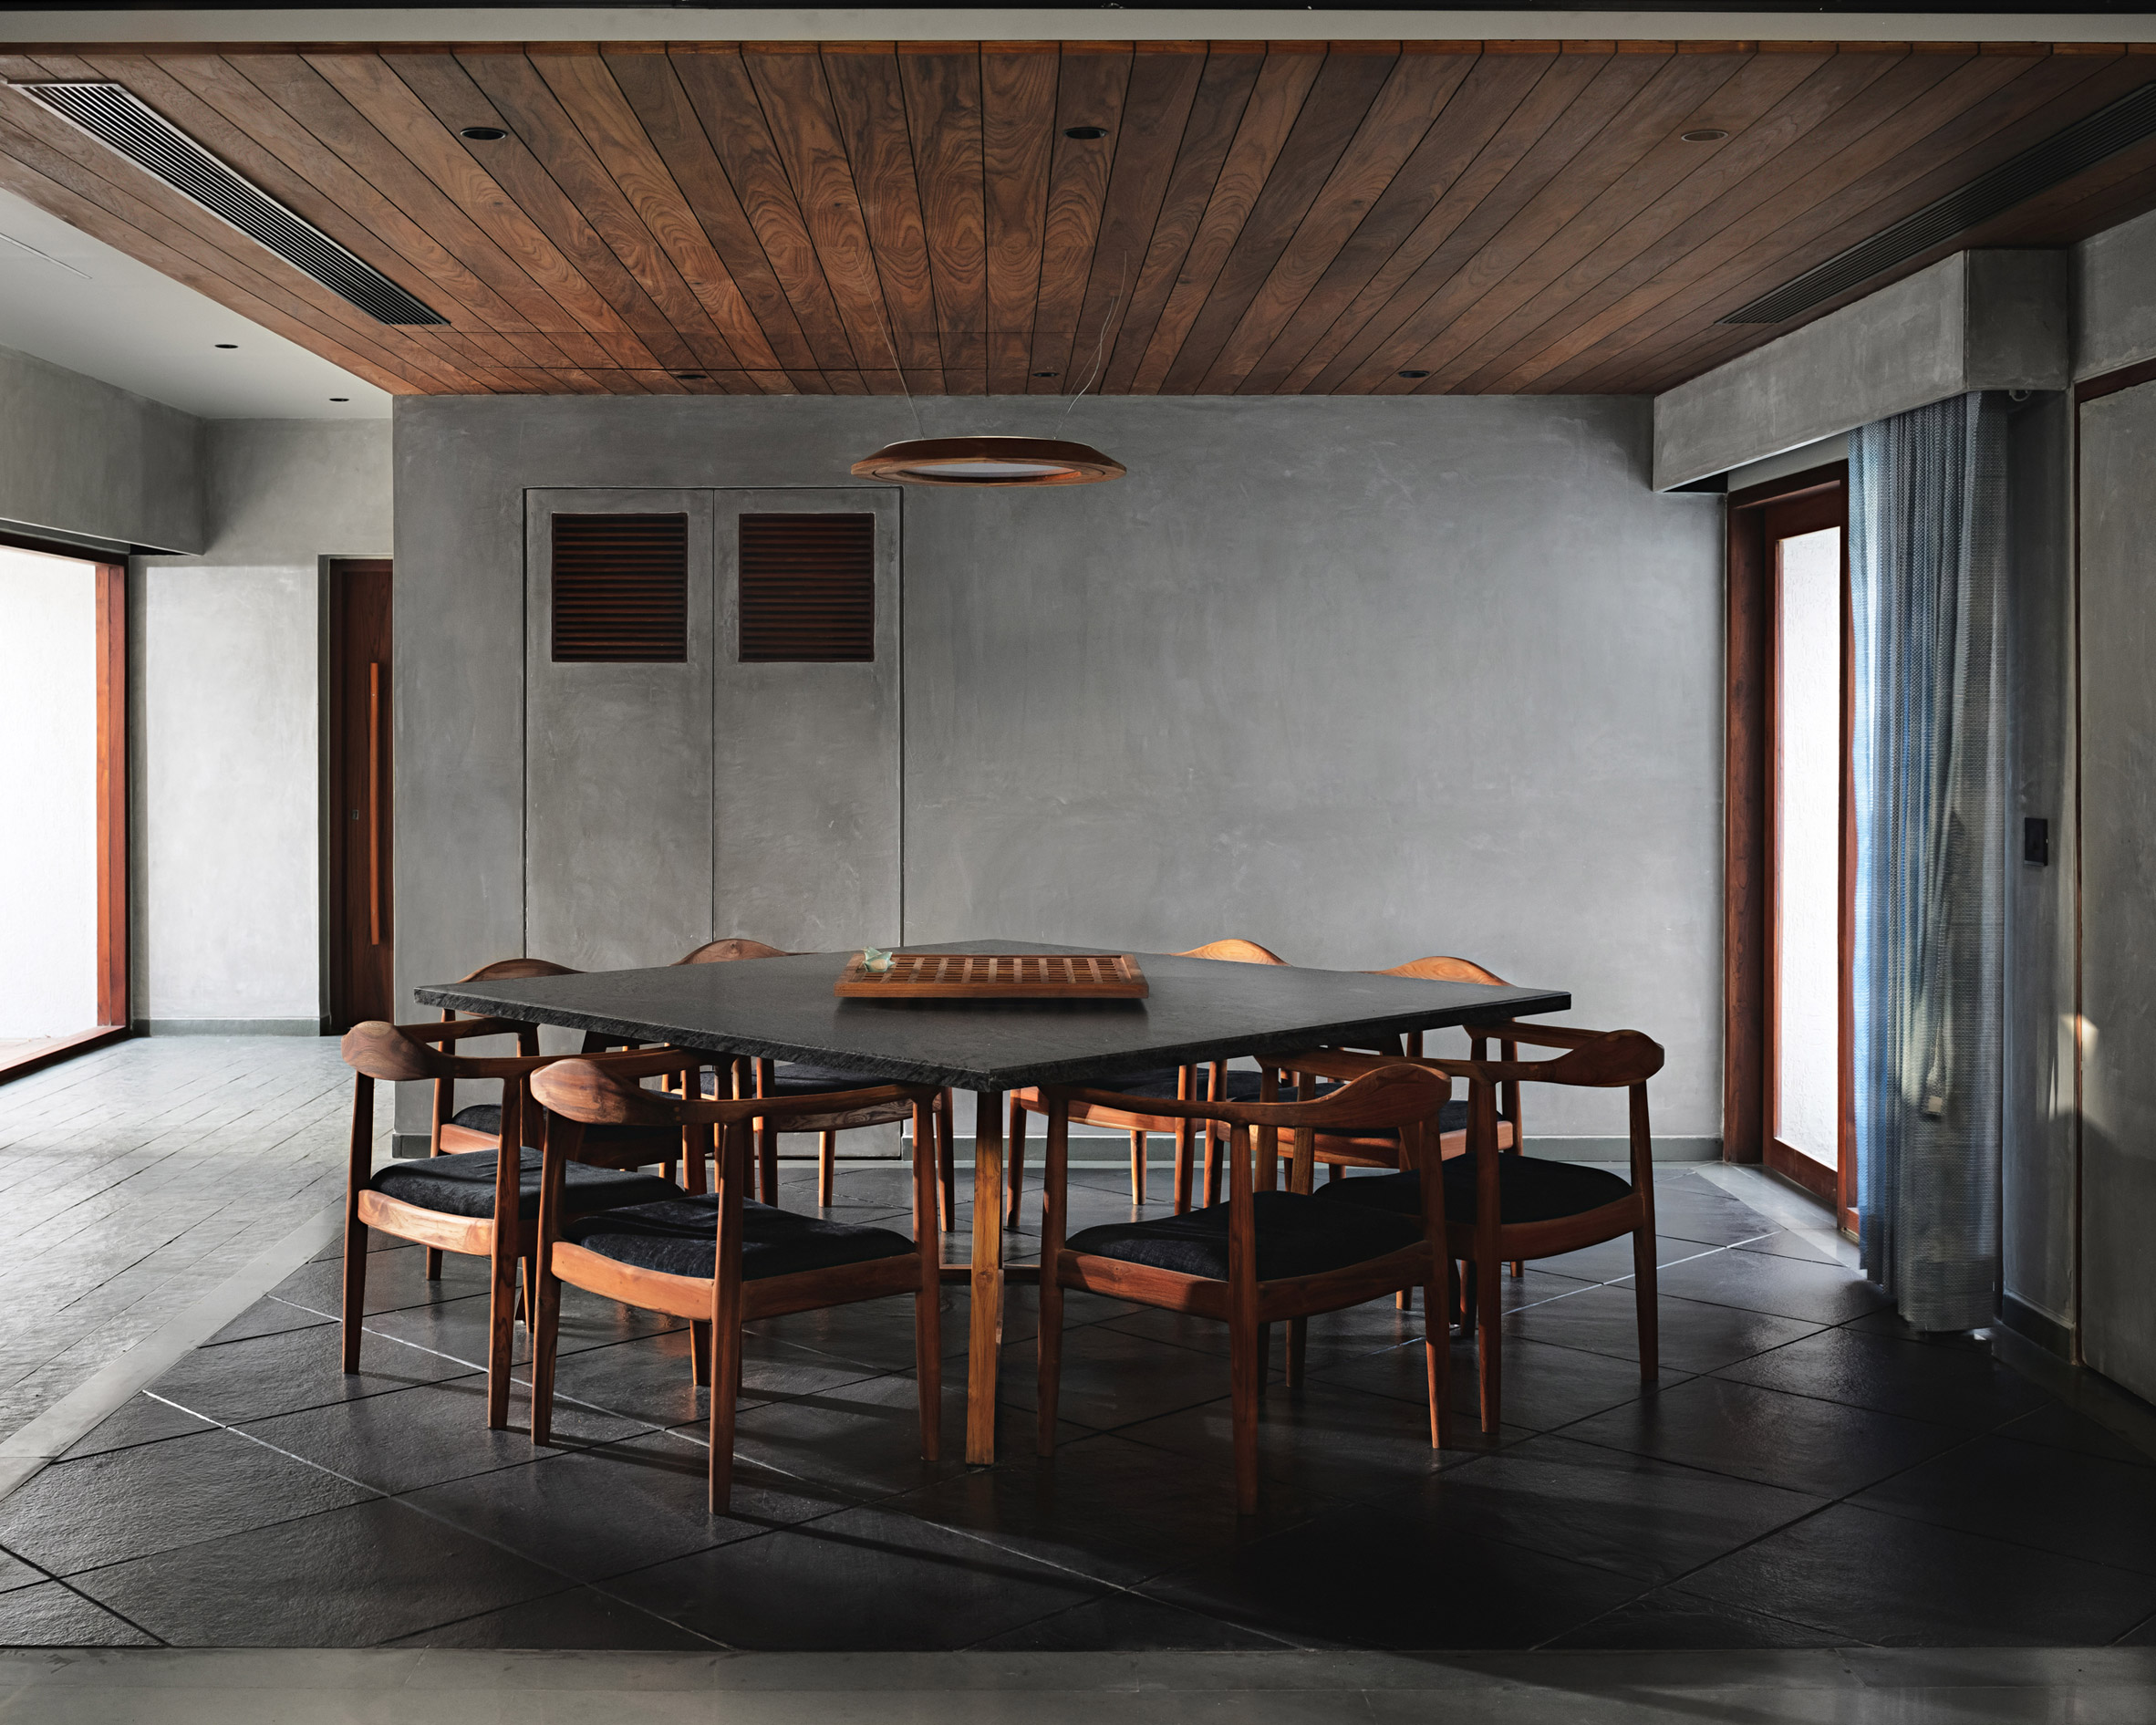 VS House designed by Sārānsh